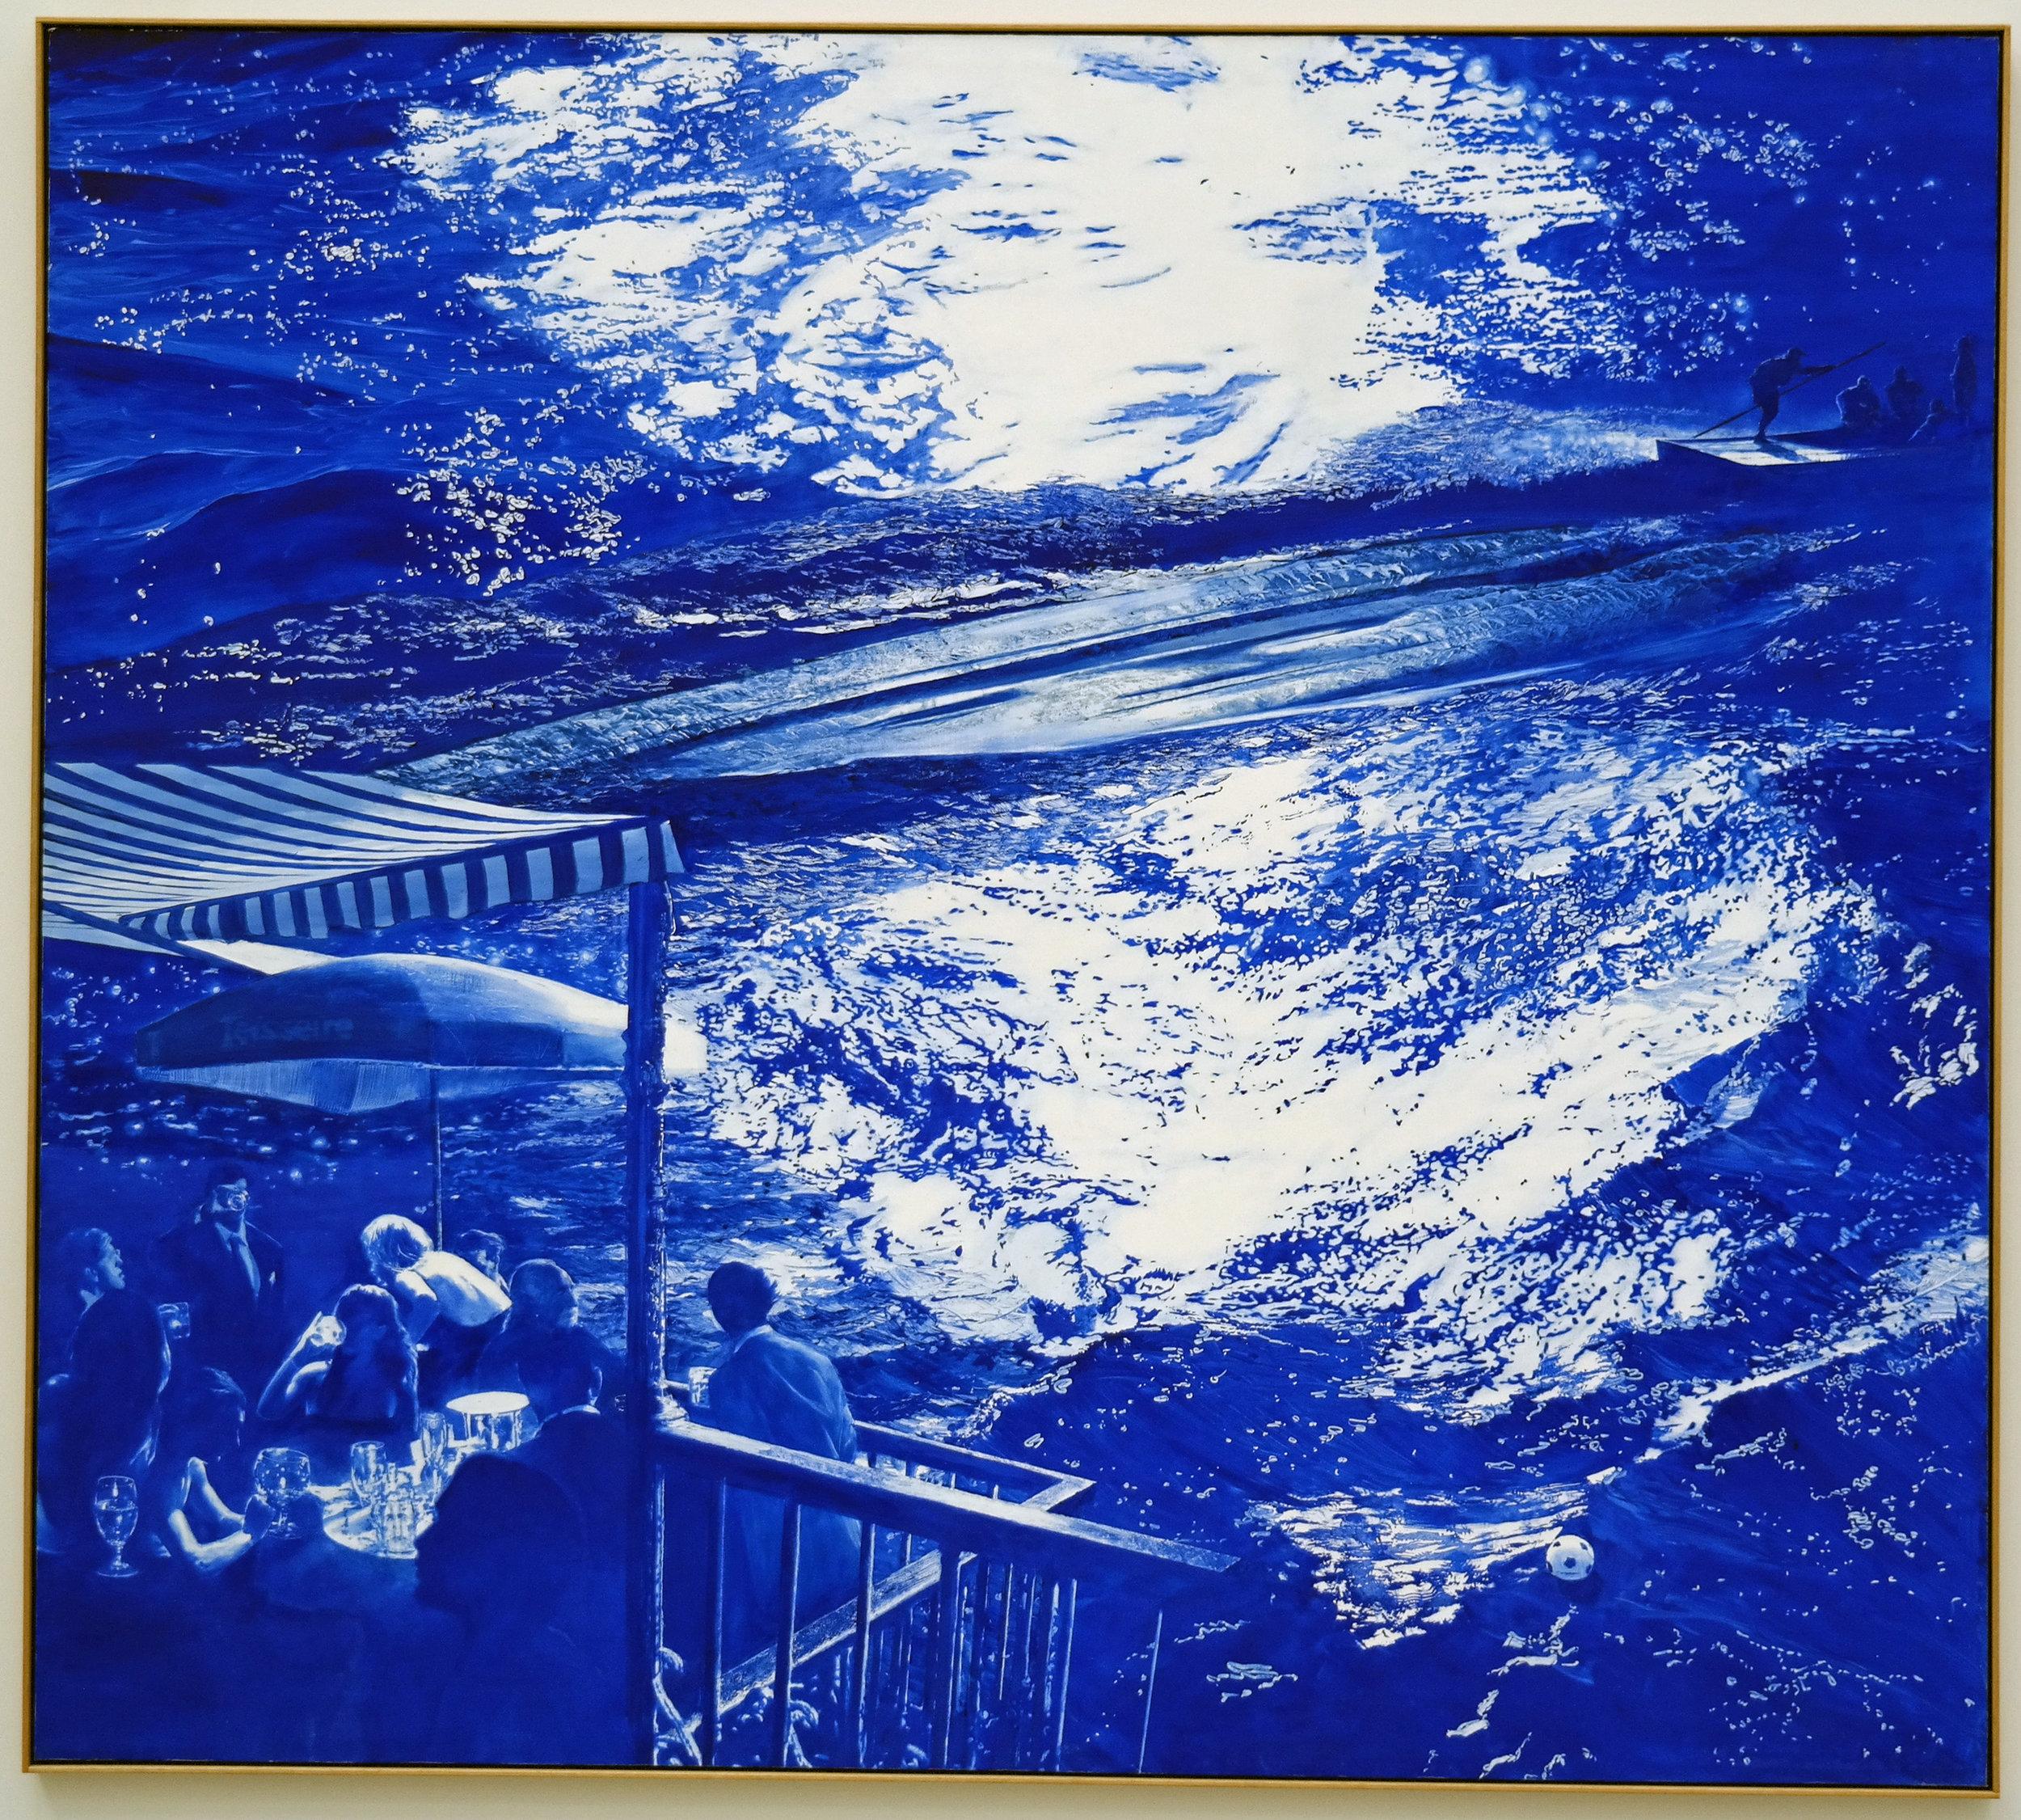 Wake, Mark Tansey, 2003